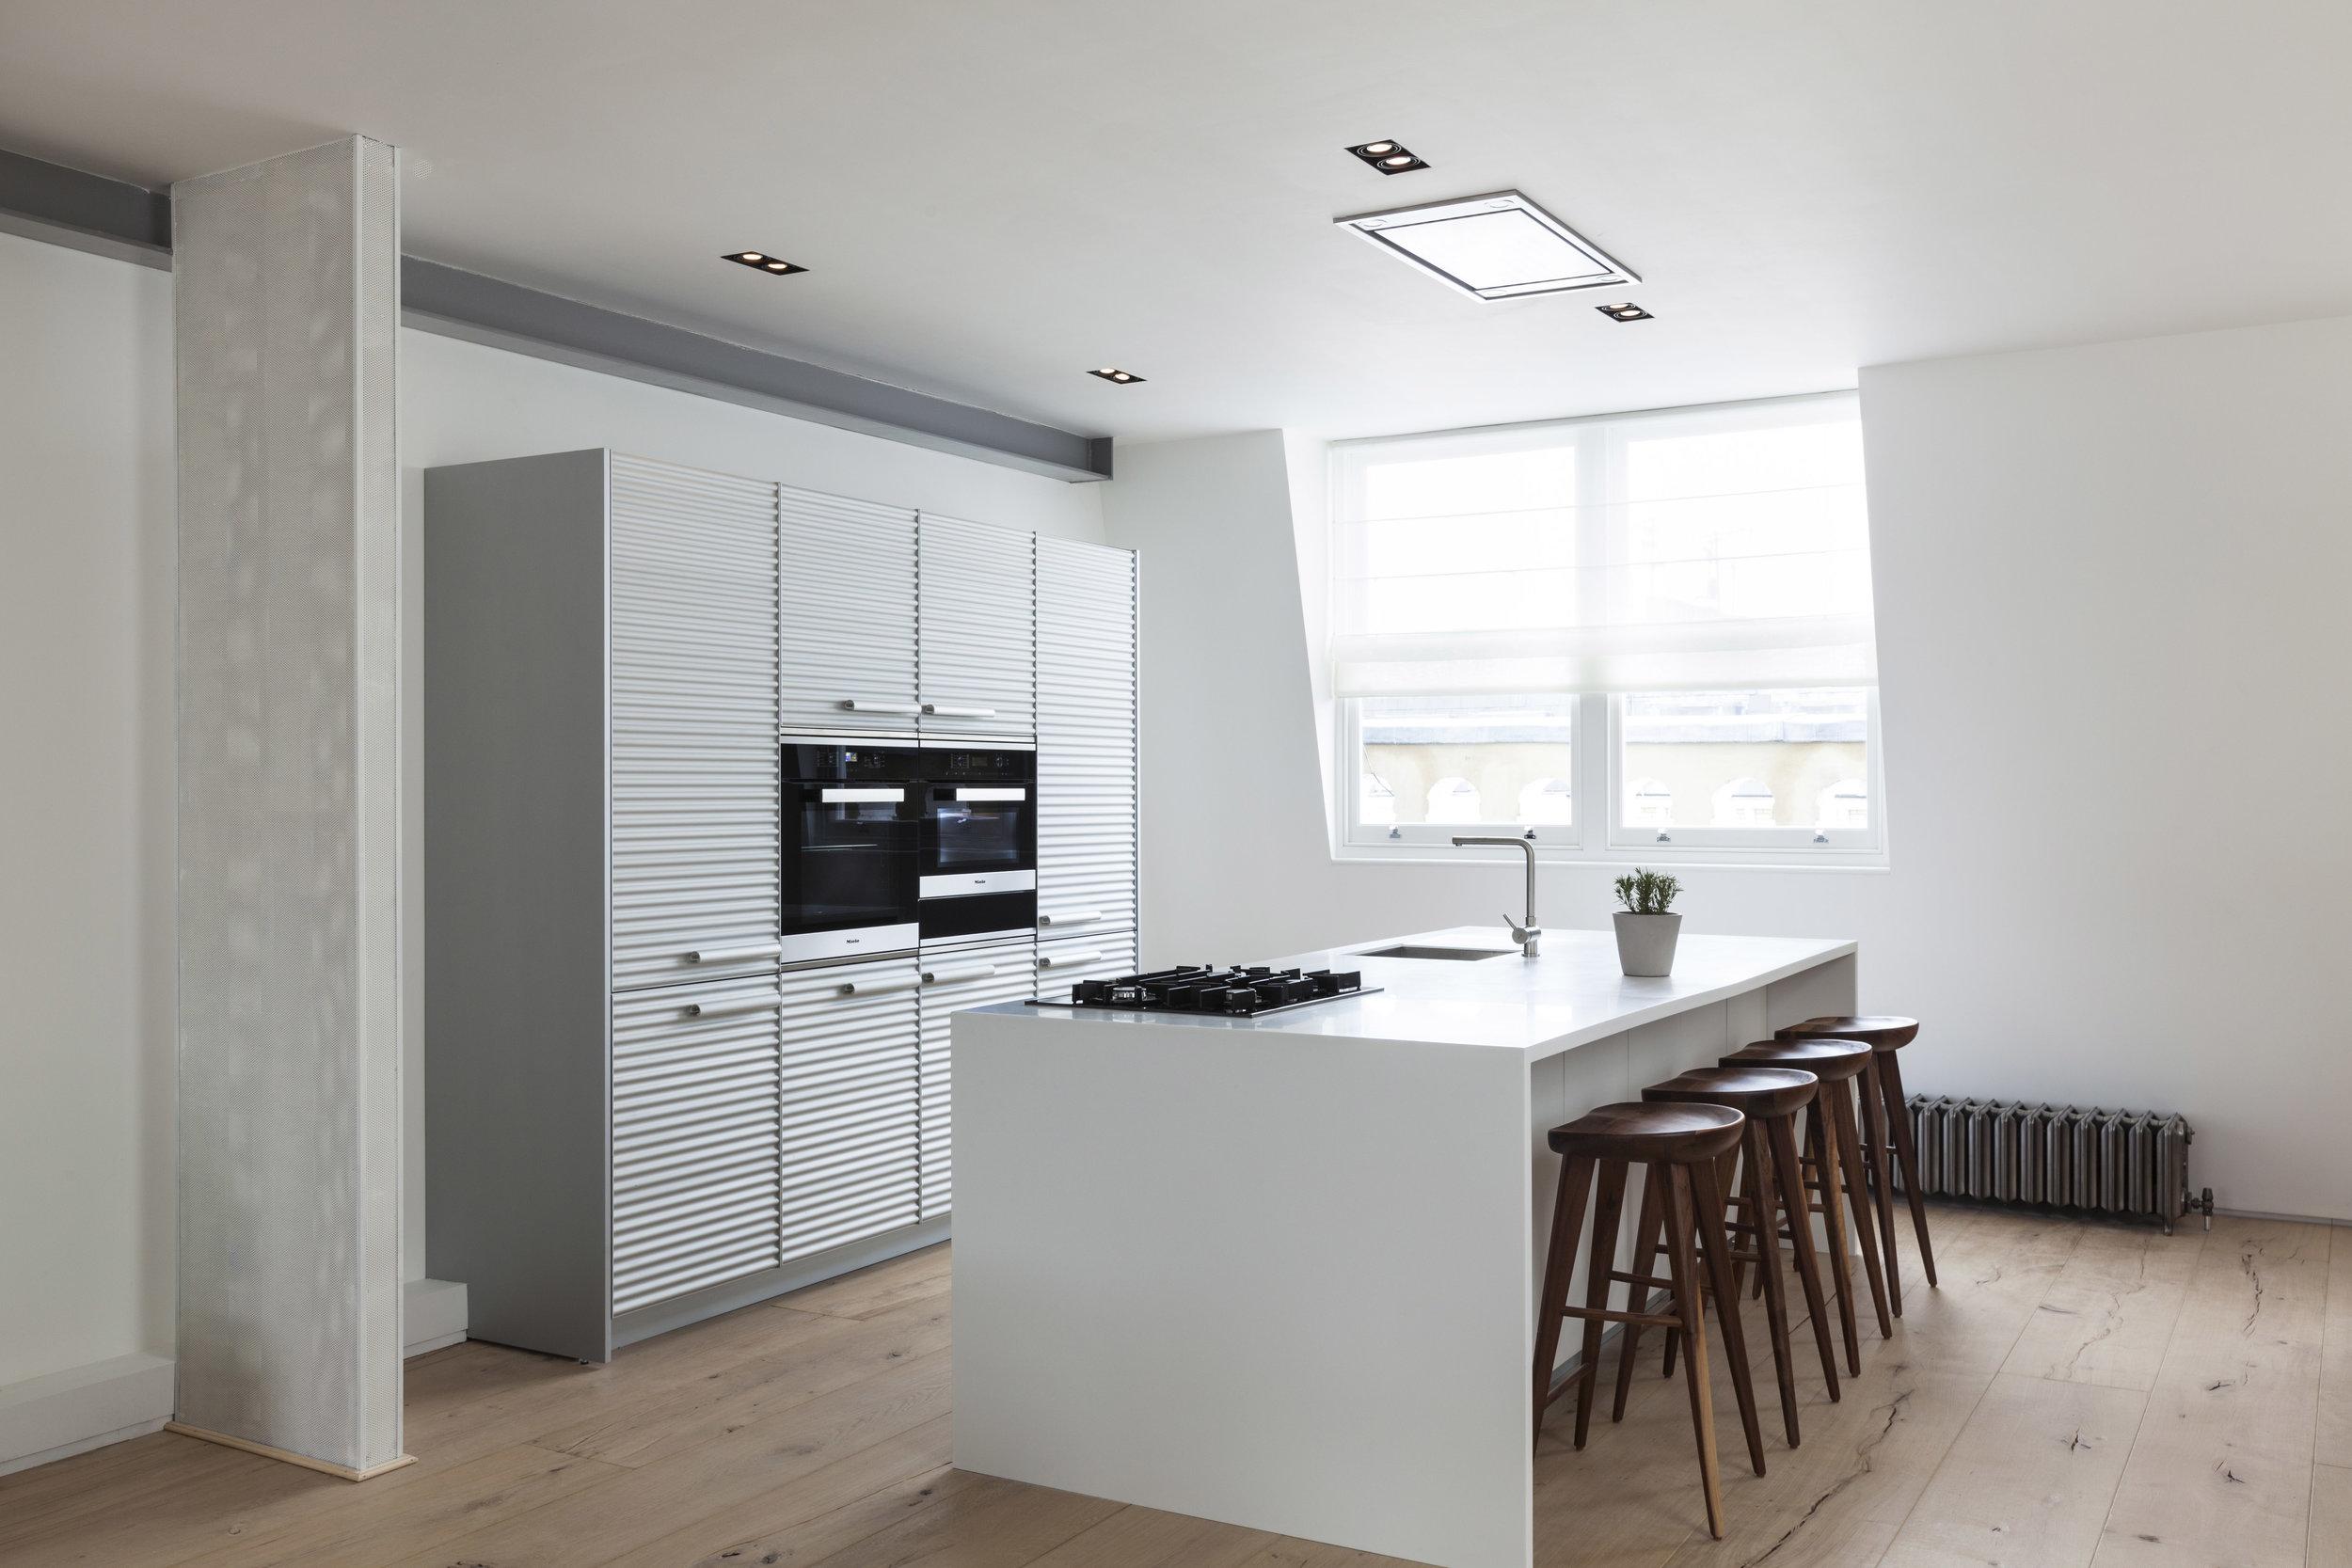 Domus-Nova-Sinclair-Road-London-Property-For-Sale-96.jpg